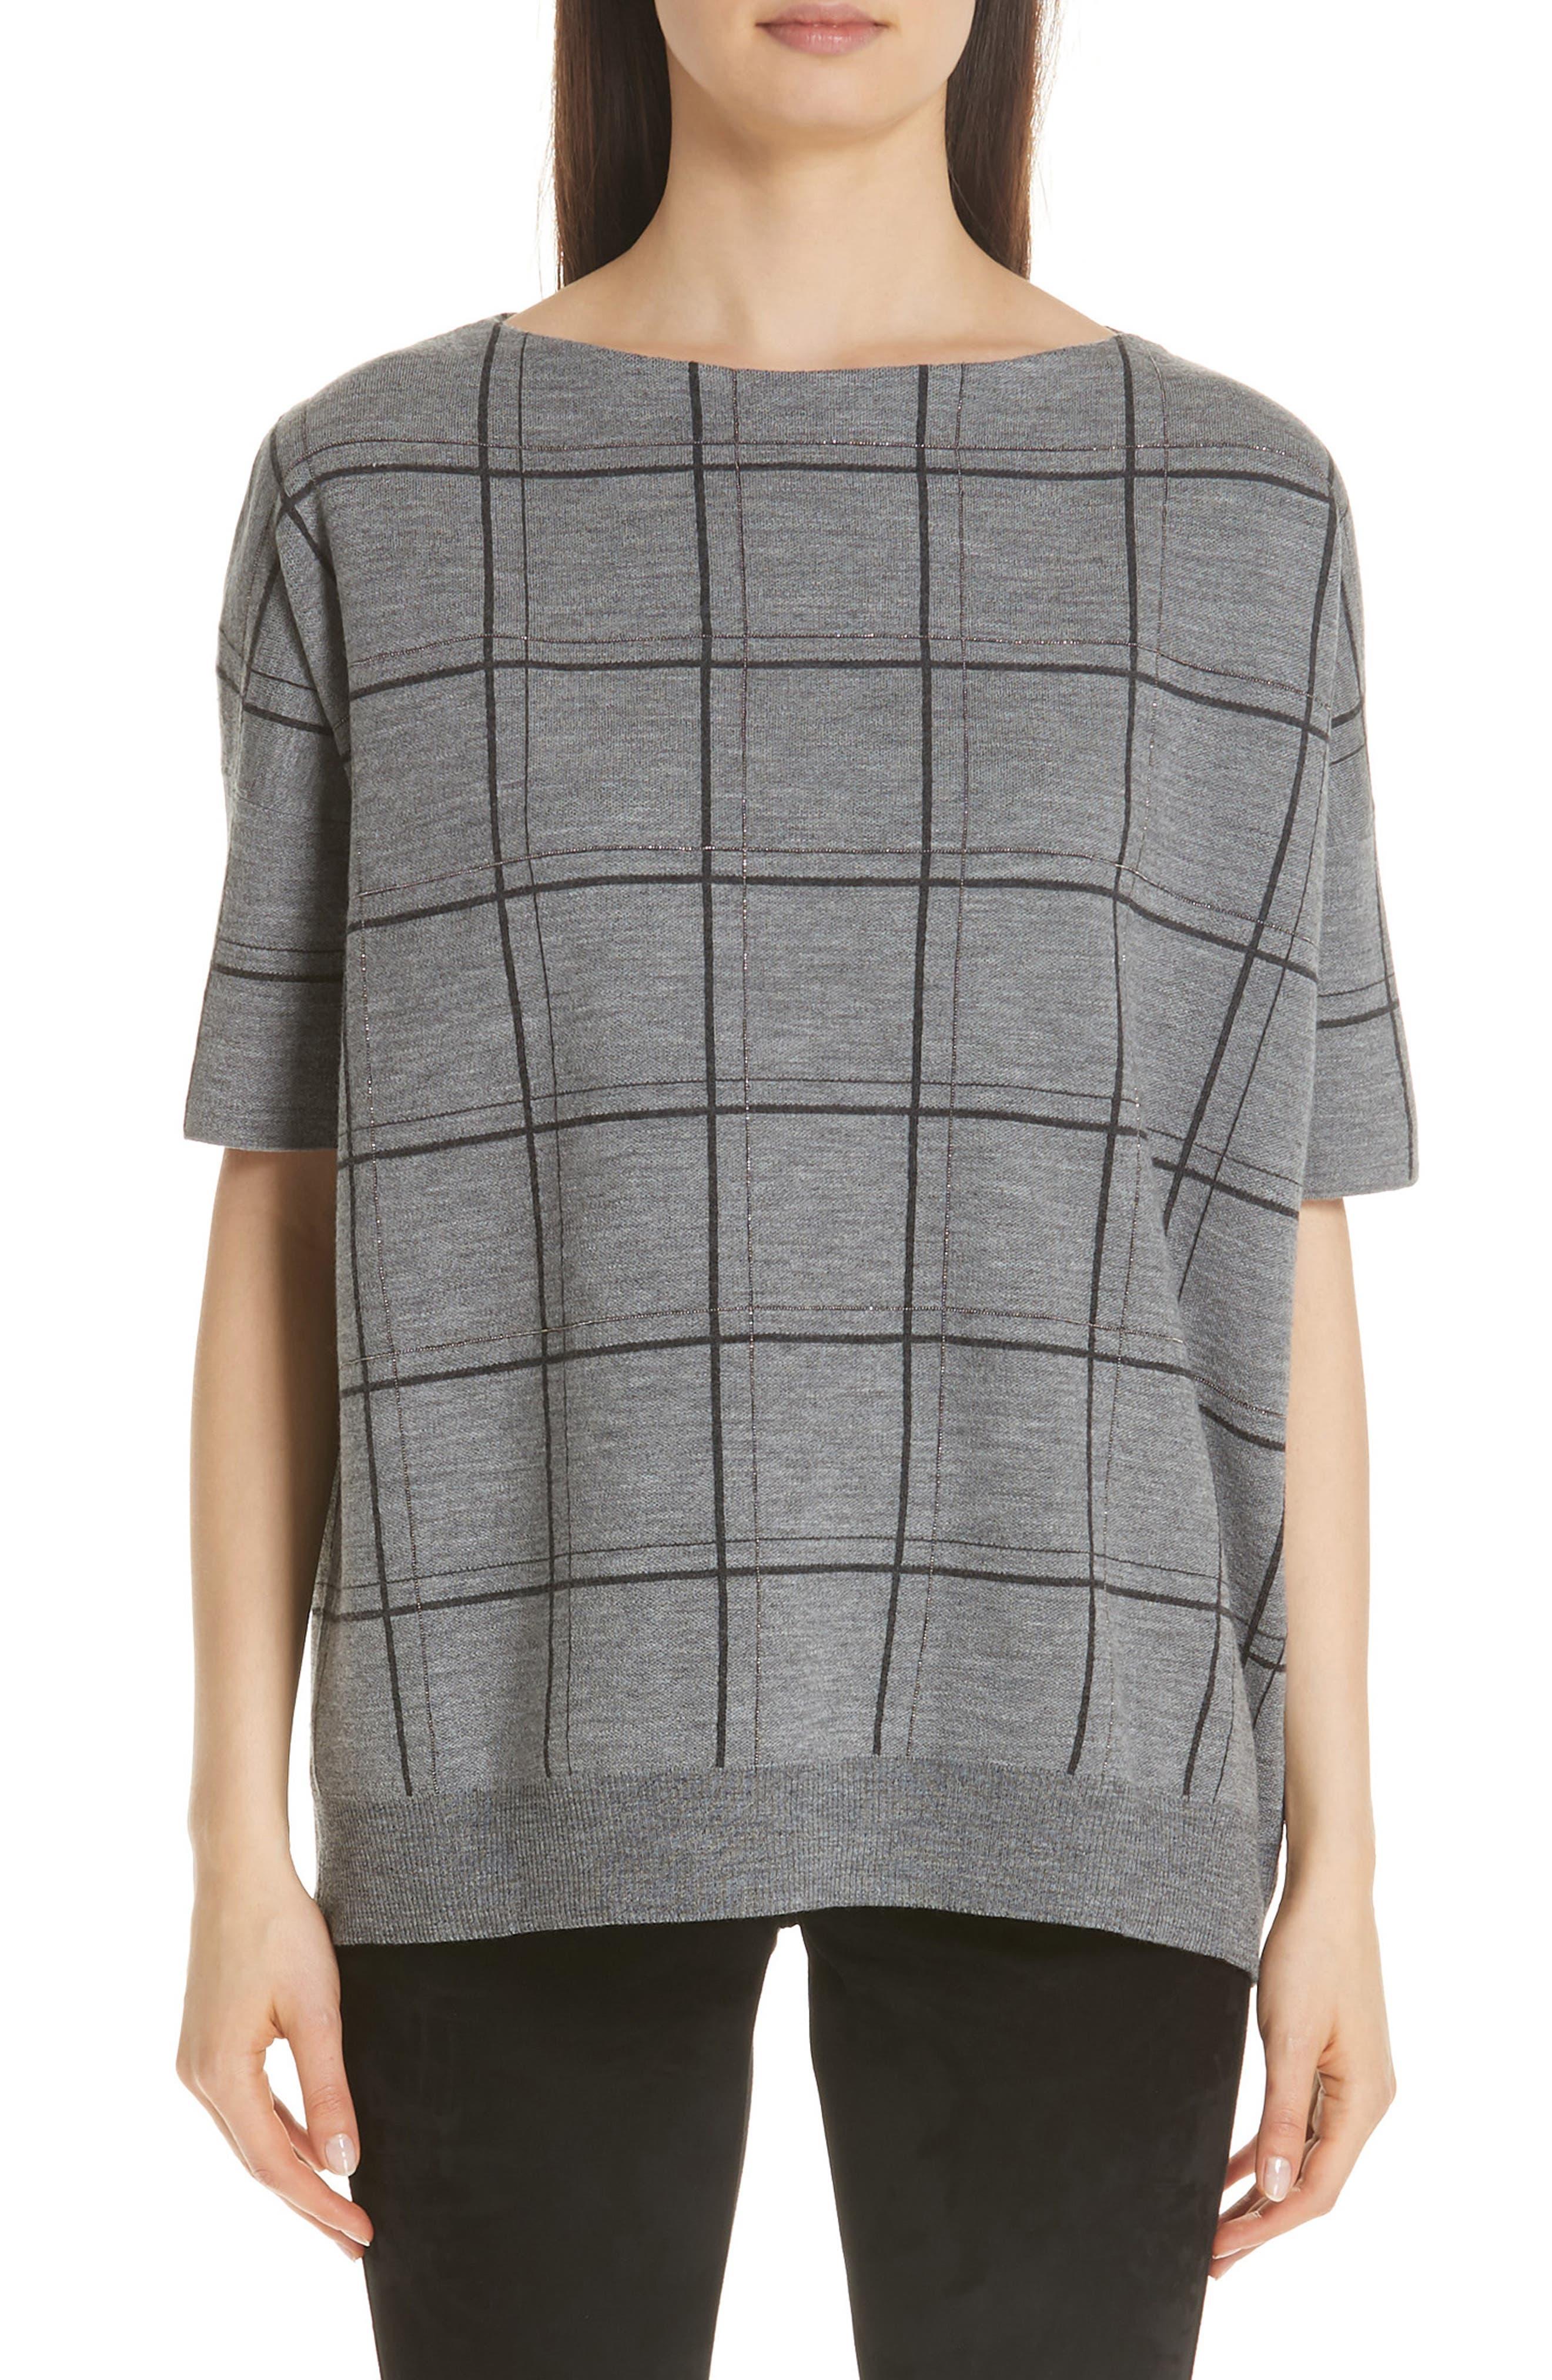 Boat-Neck Short-Sleeve Oversized Check Jacquard Sweater in Nickel Multi